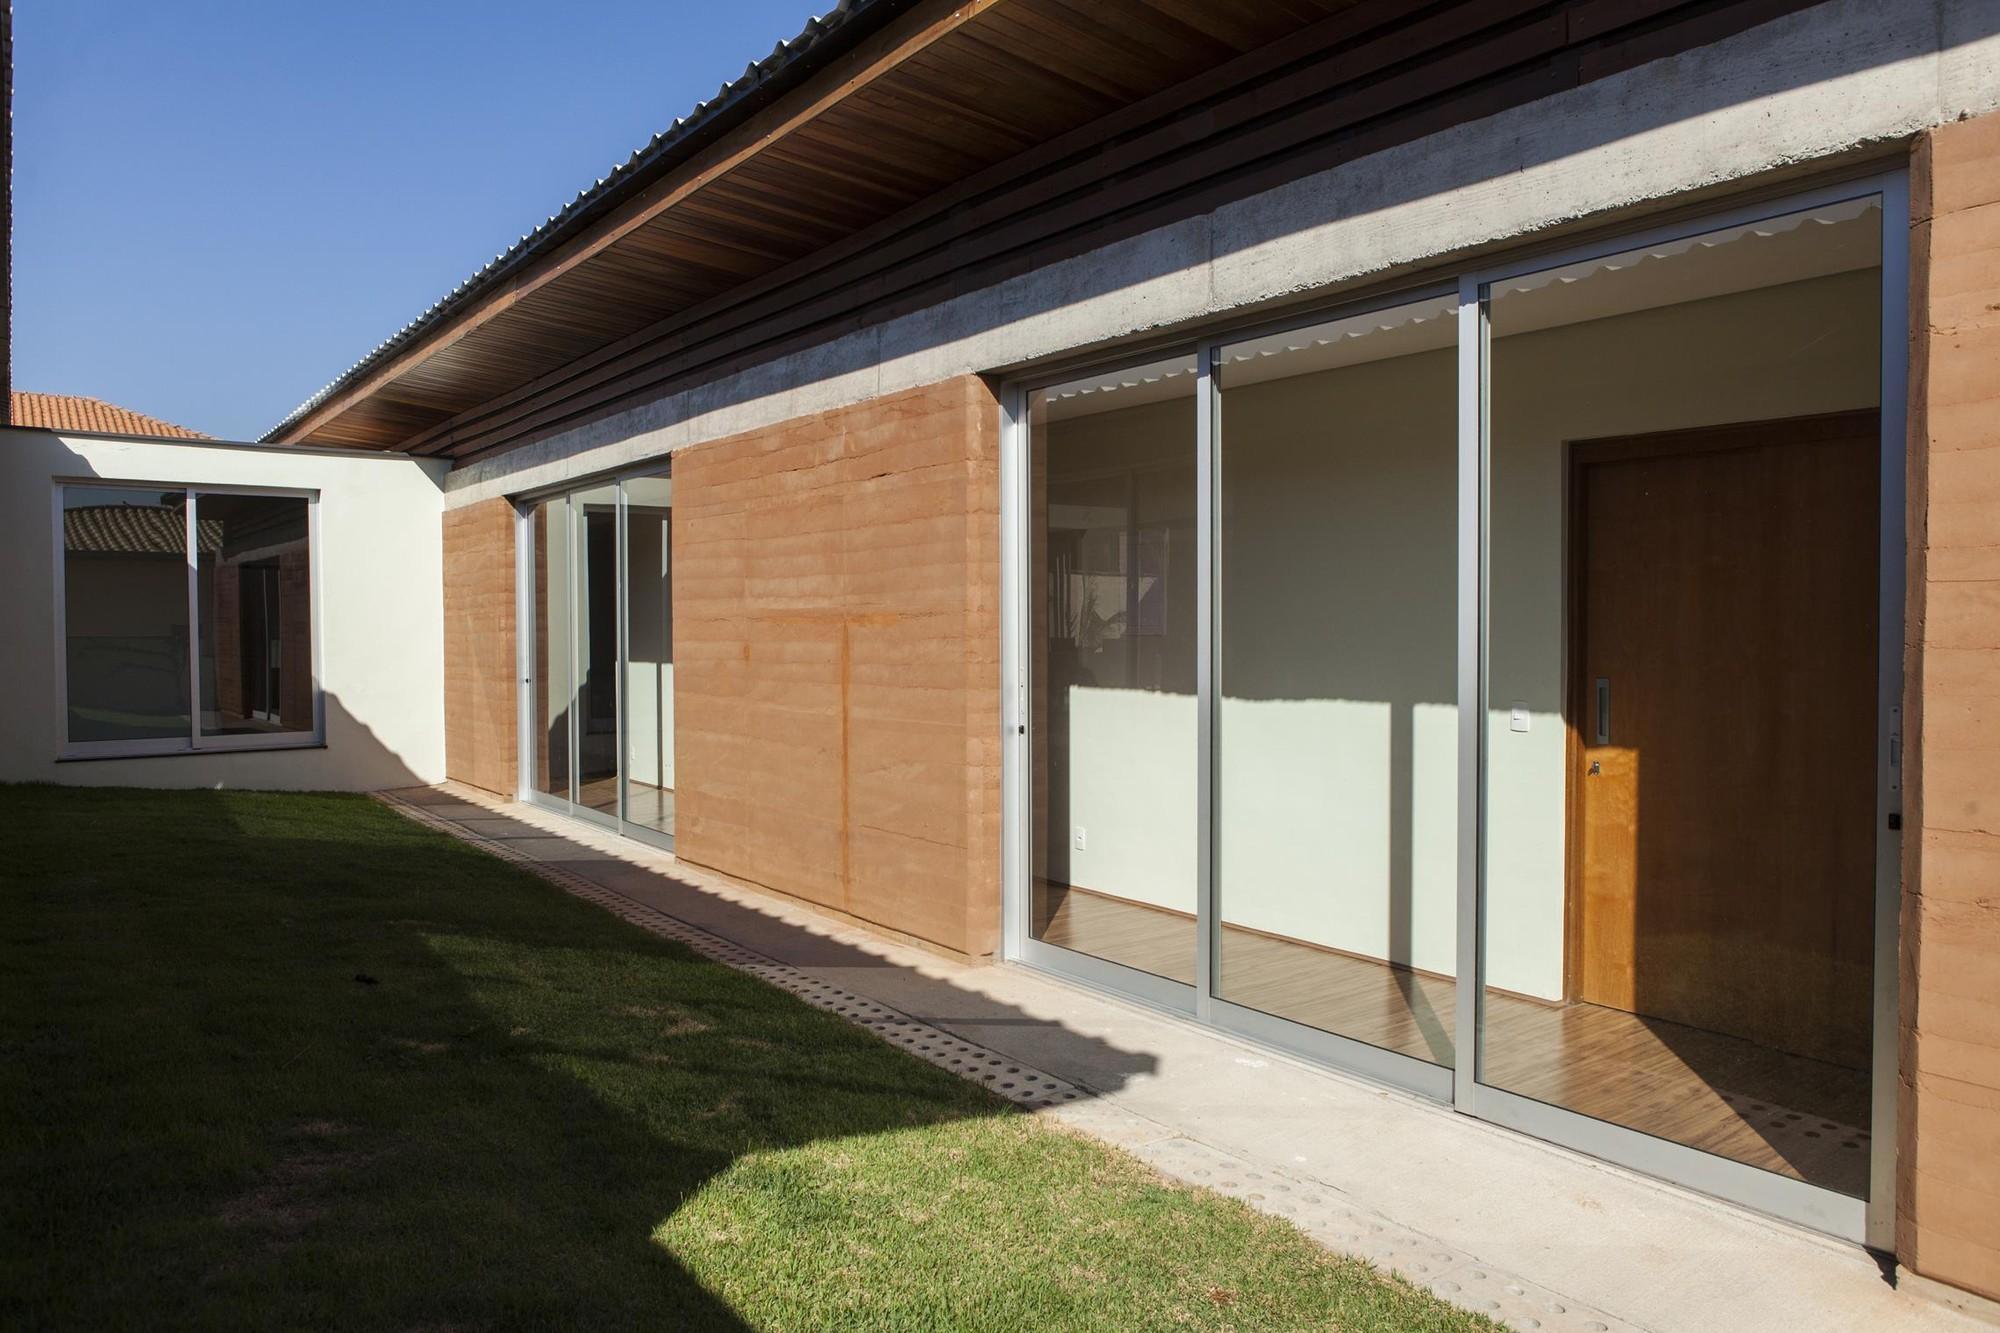 Casa Colinas / FATO Arquitetura, © Paulo Heise